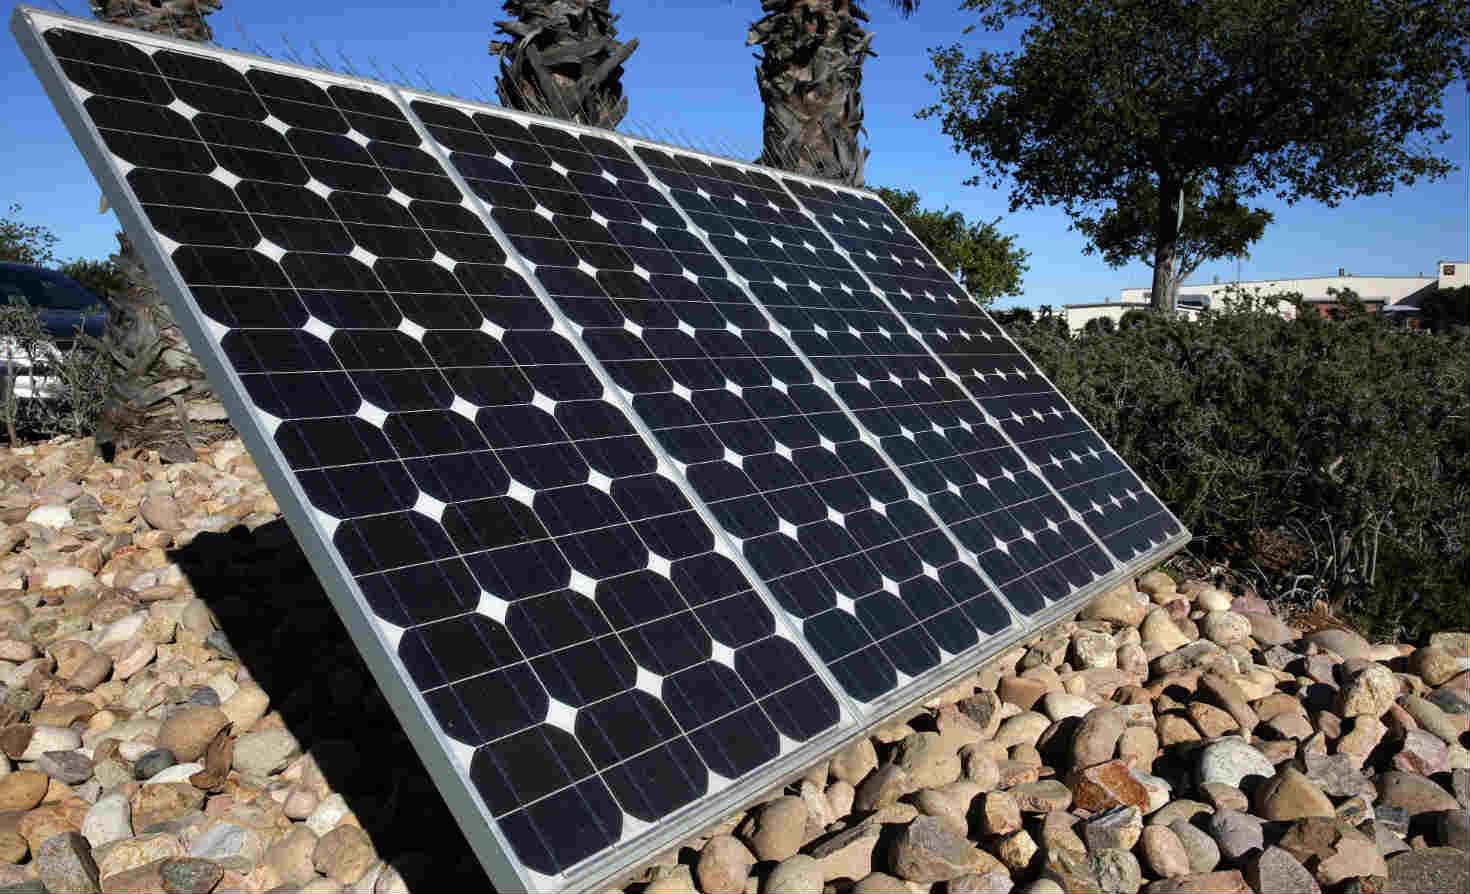 Solar panels at MCASM